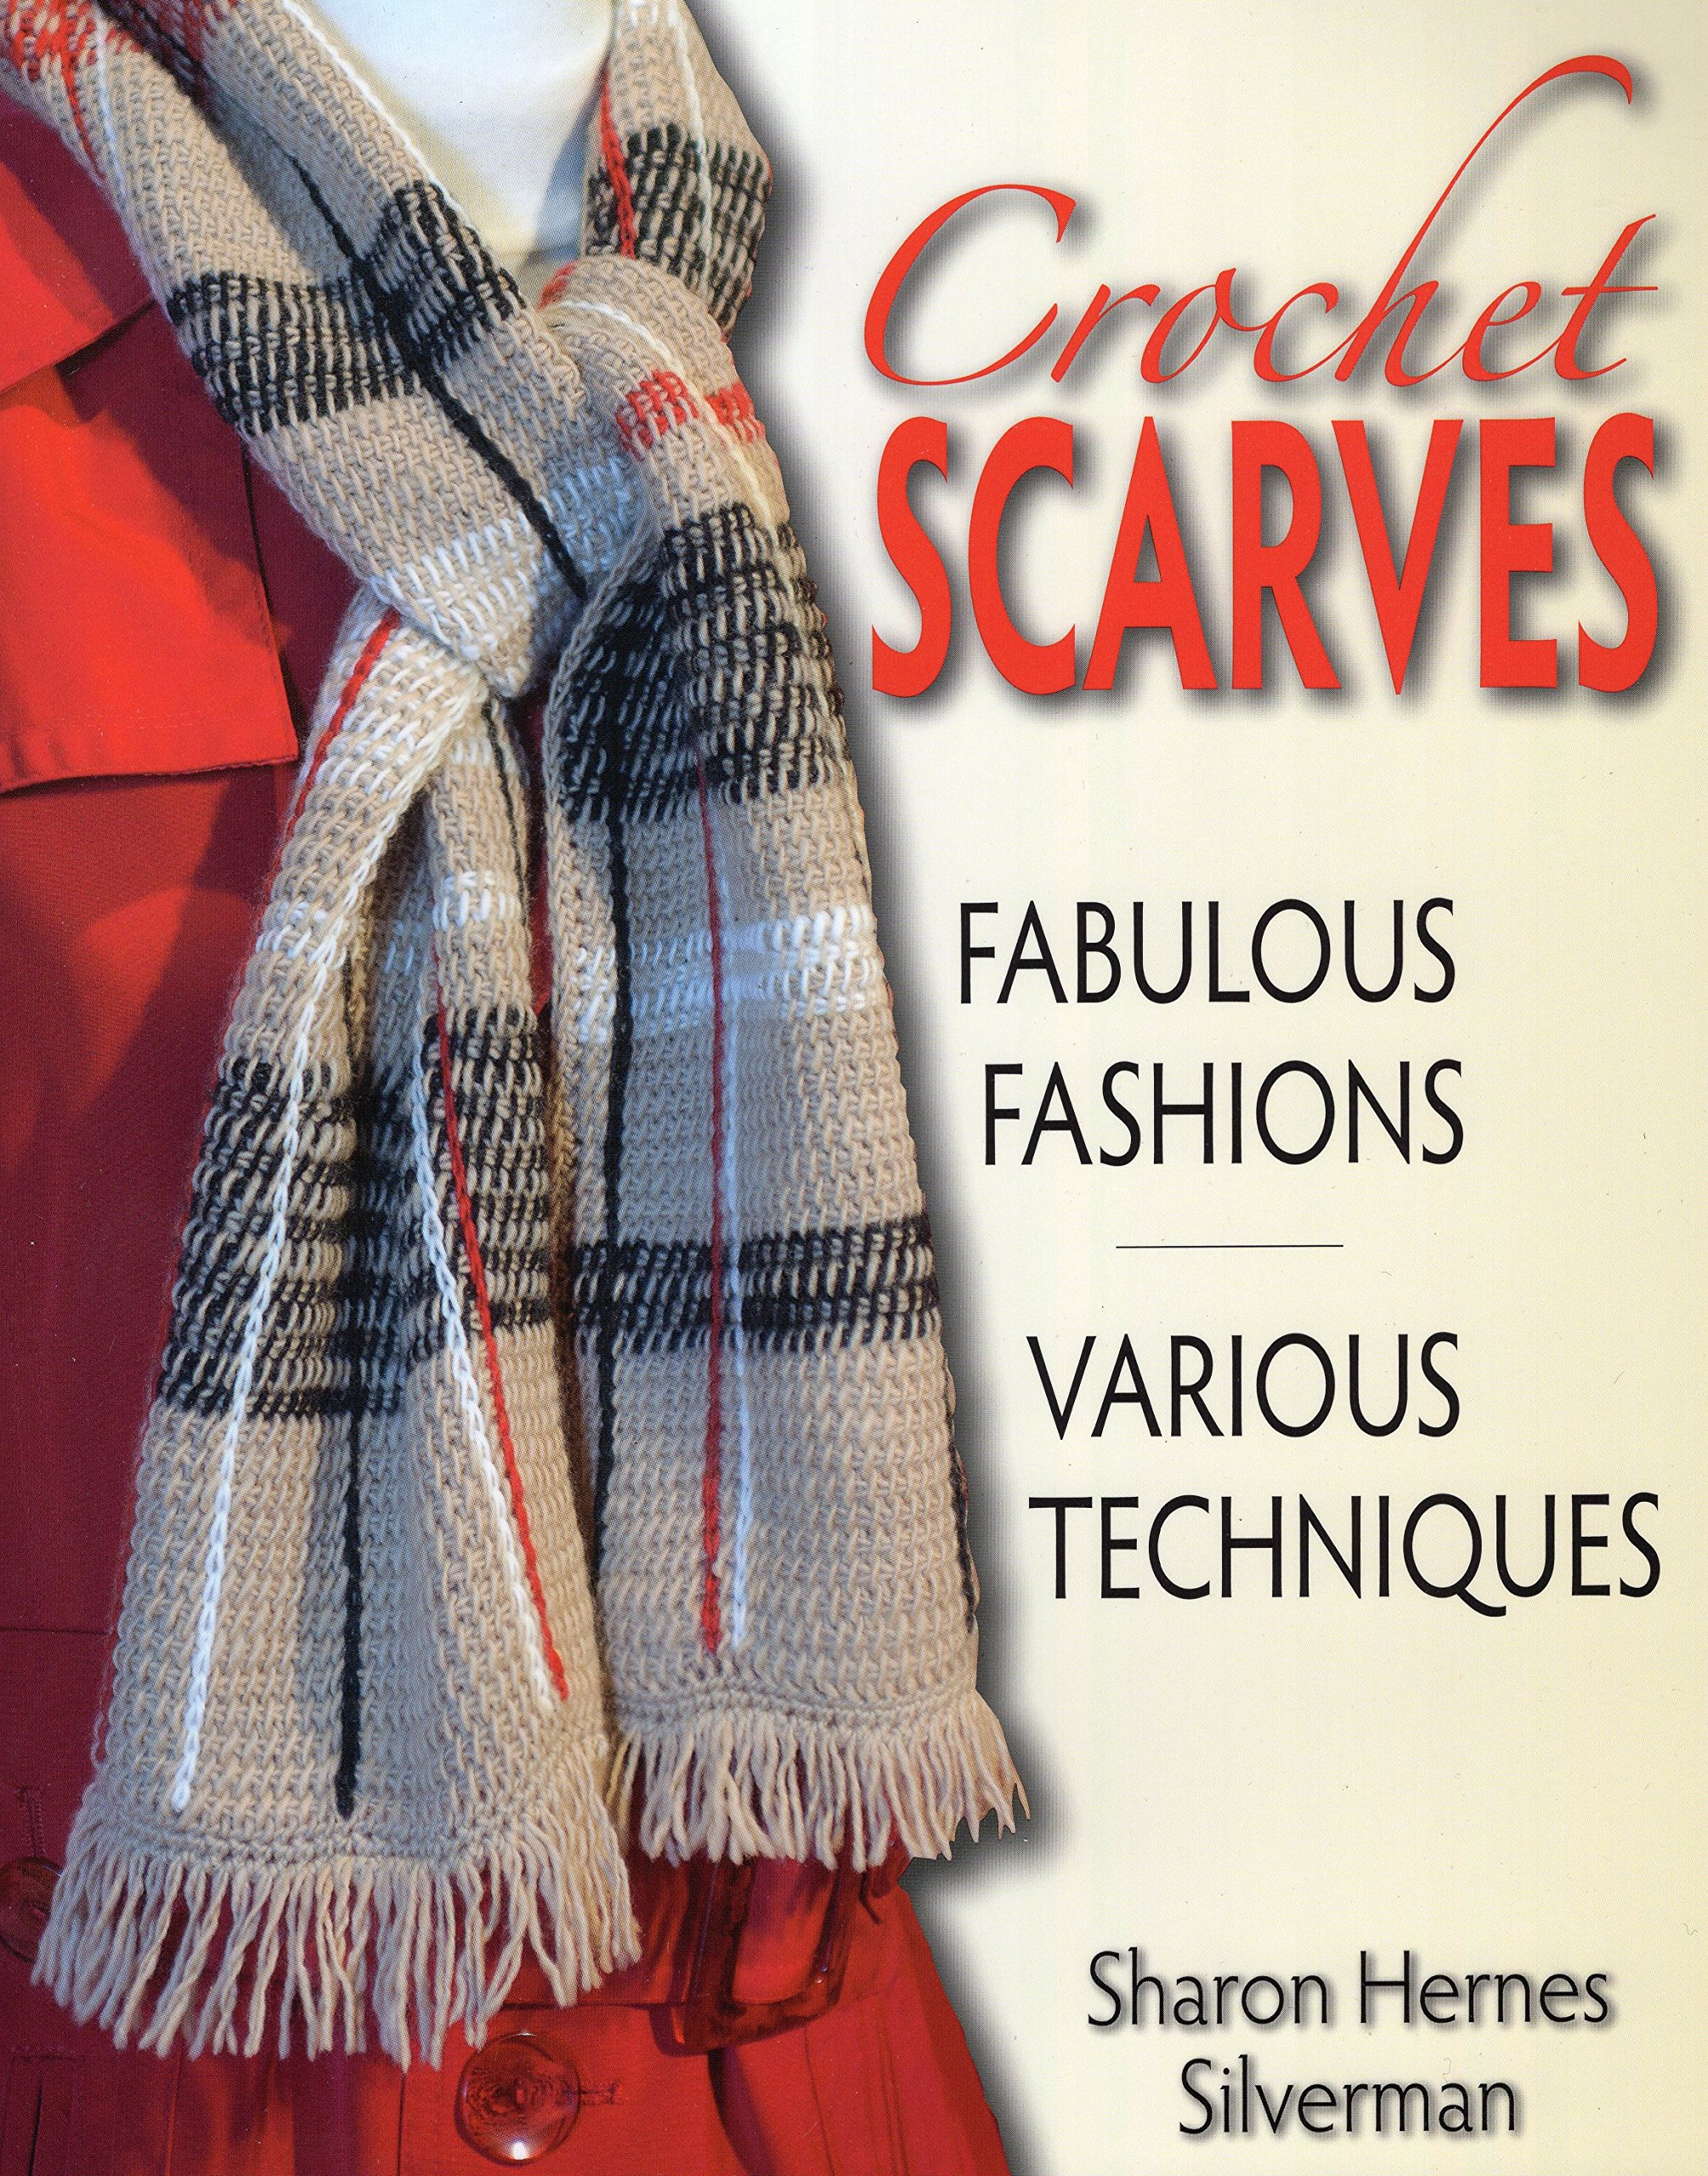 Crochet Scarves Fabulous Fashions Various Techniques Sharon All Shawl Stitch Diagrams Doris Chan Hernes Silverman 9780811700818 Books